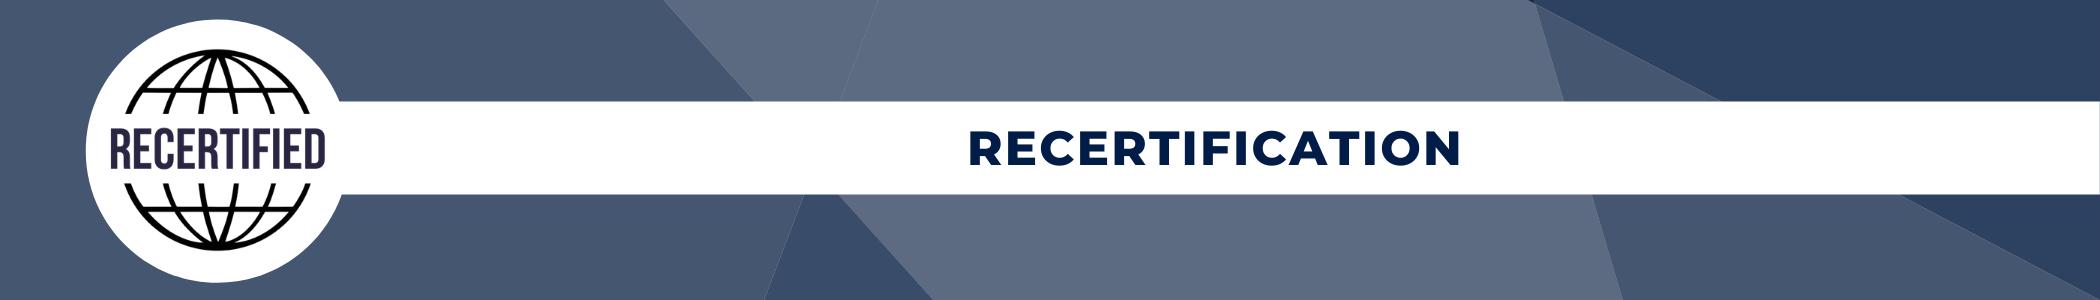 IAITAM Recertification